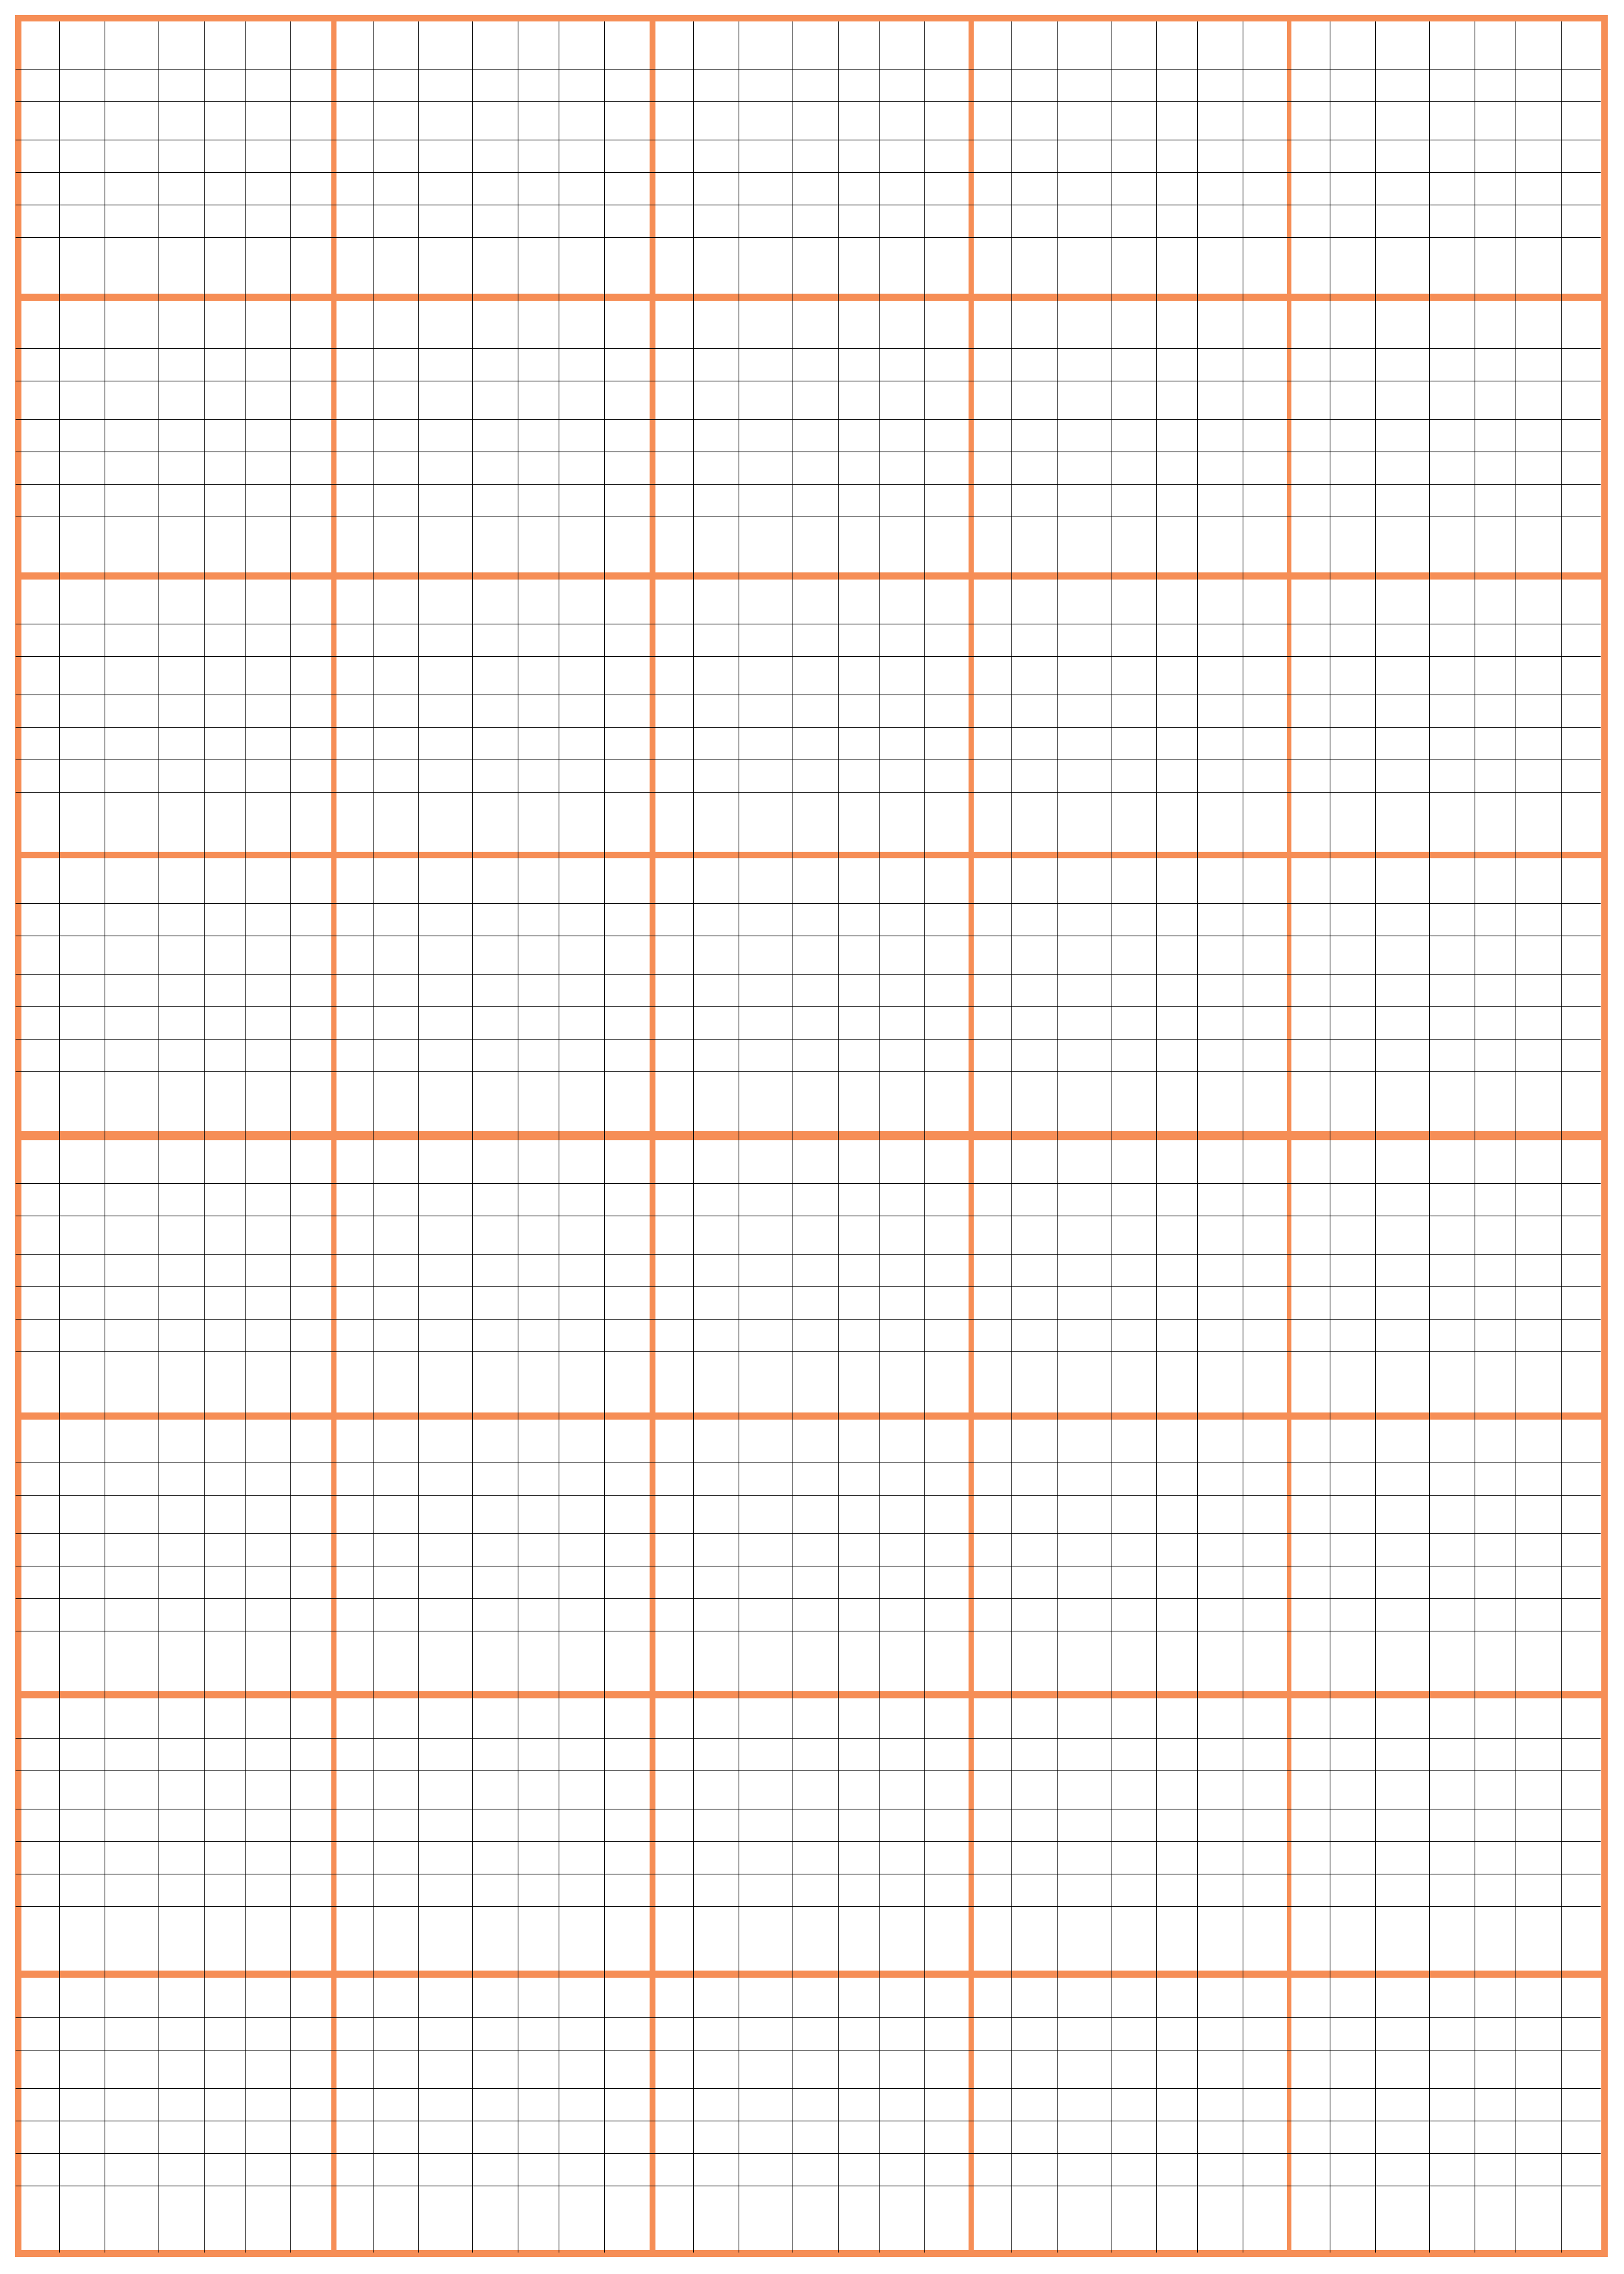 Transparent Graph Paper For Cross Stitch